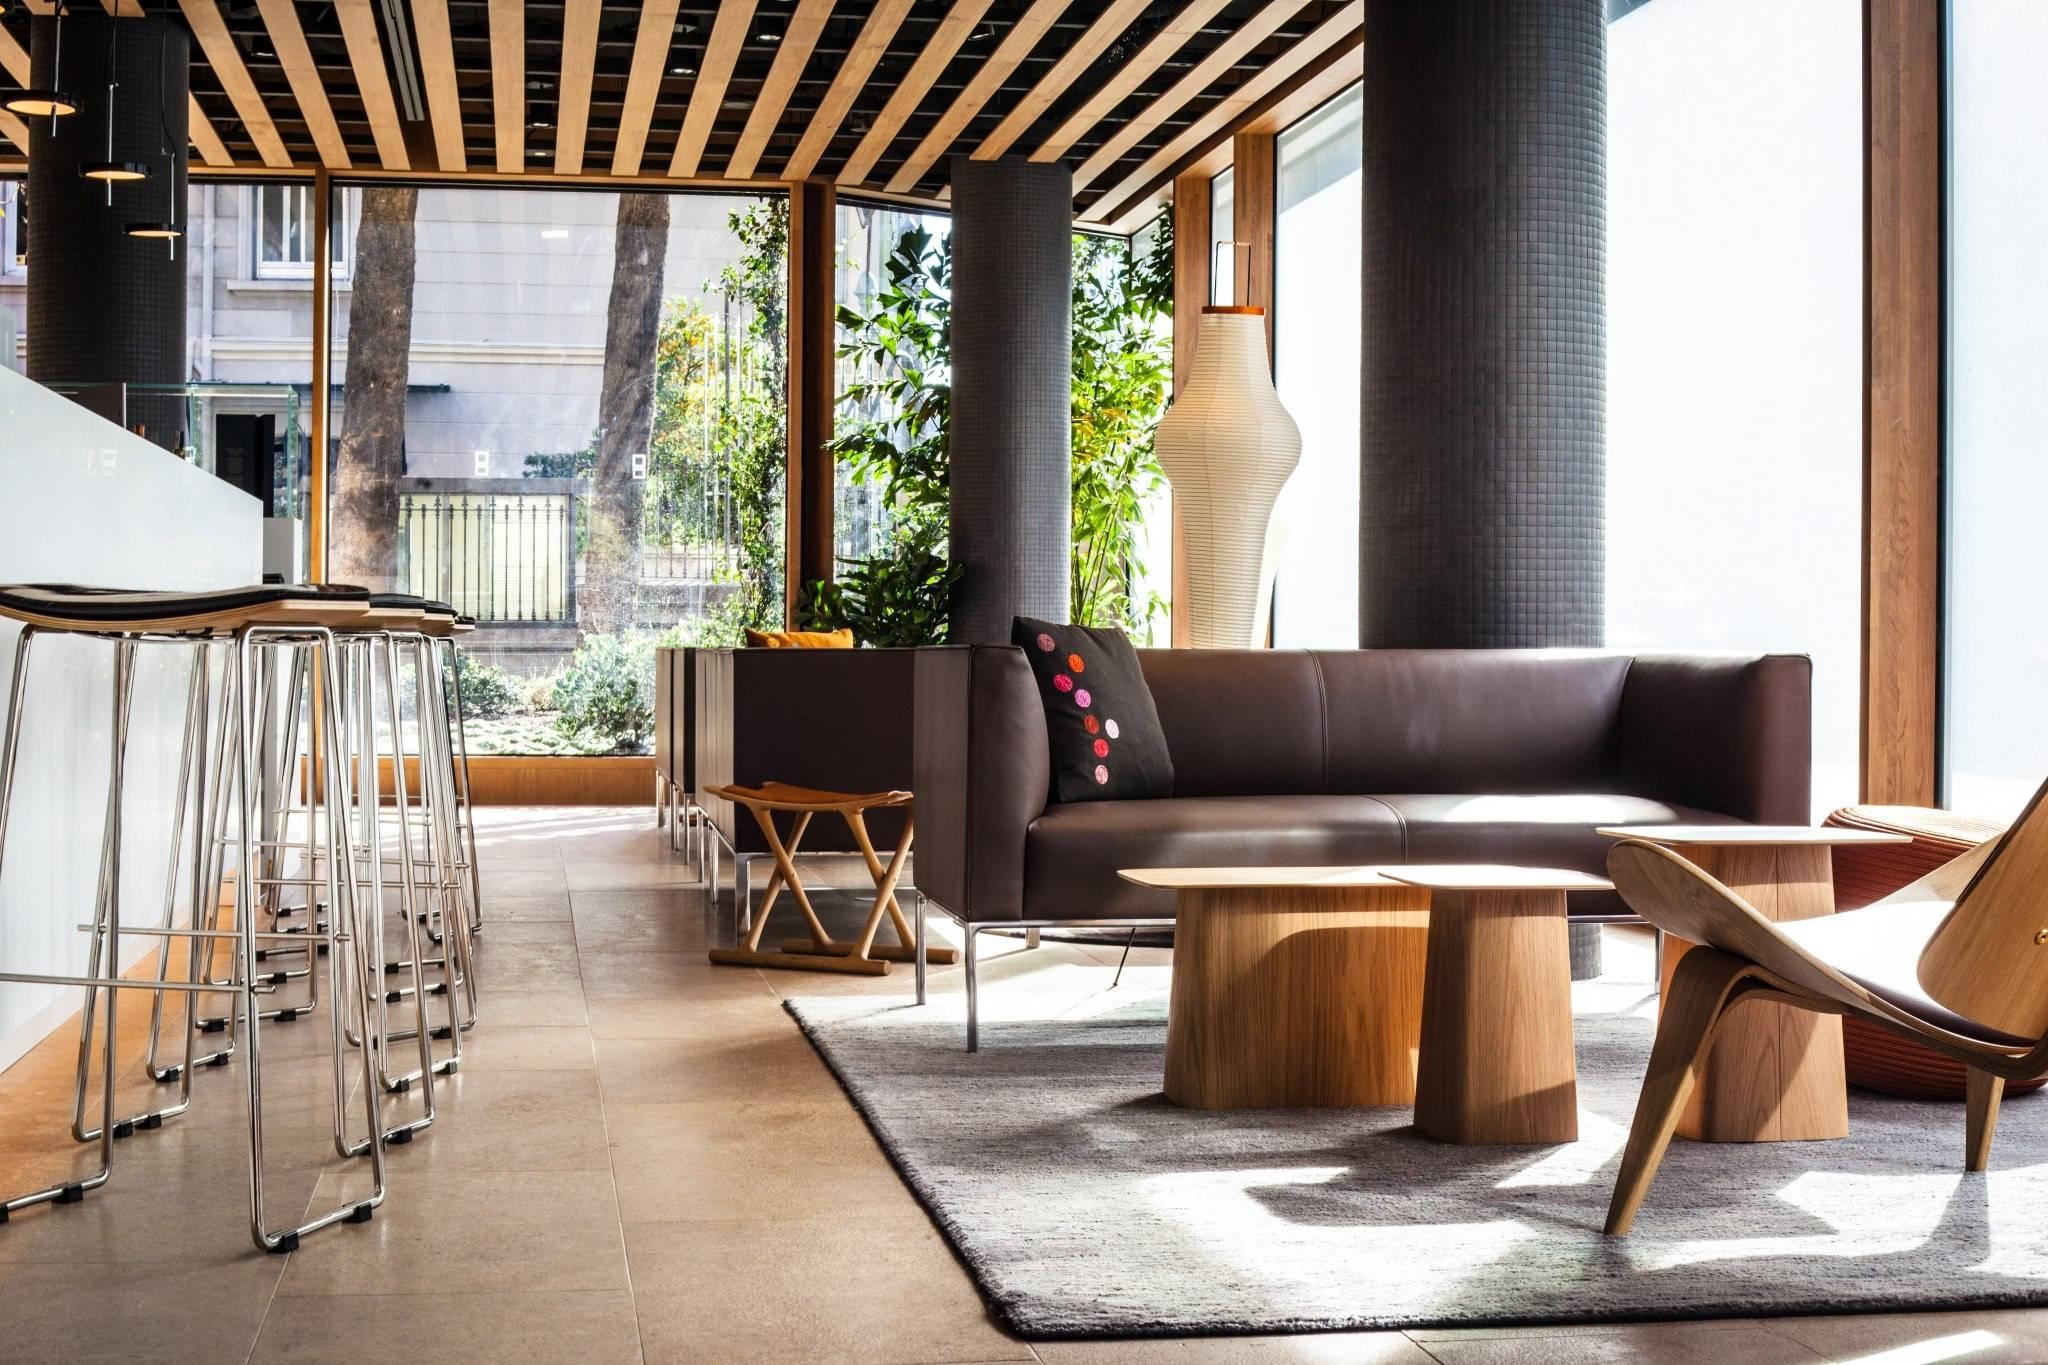 mediterranean home interior designs photos modern mediterranean interior design luxury od design latest design des idees de decoration interieur moderne